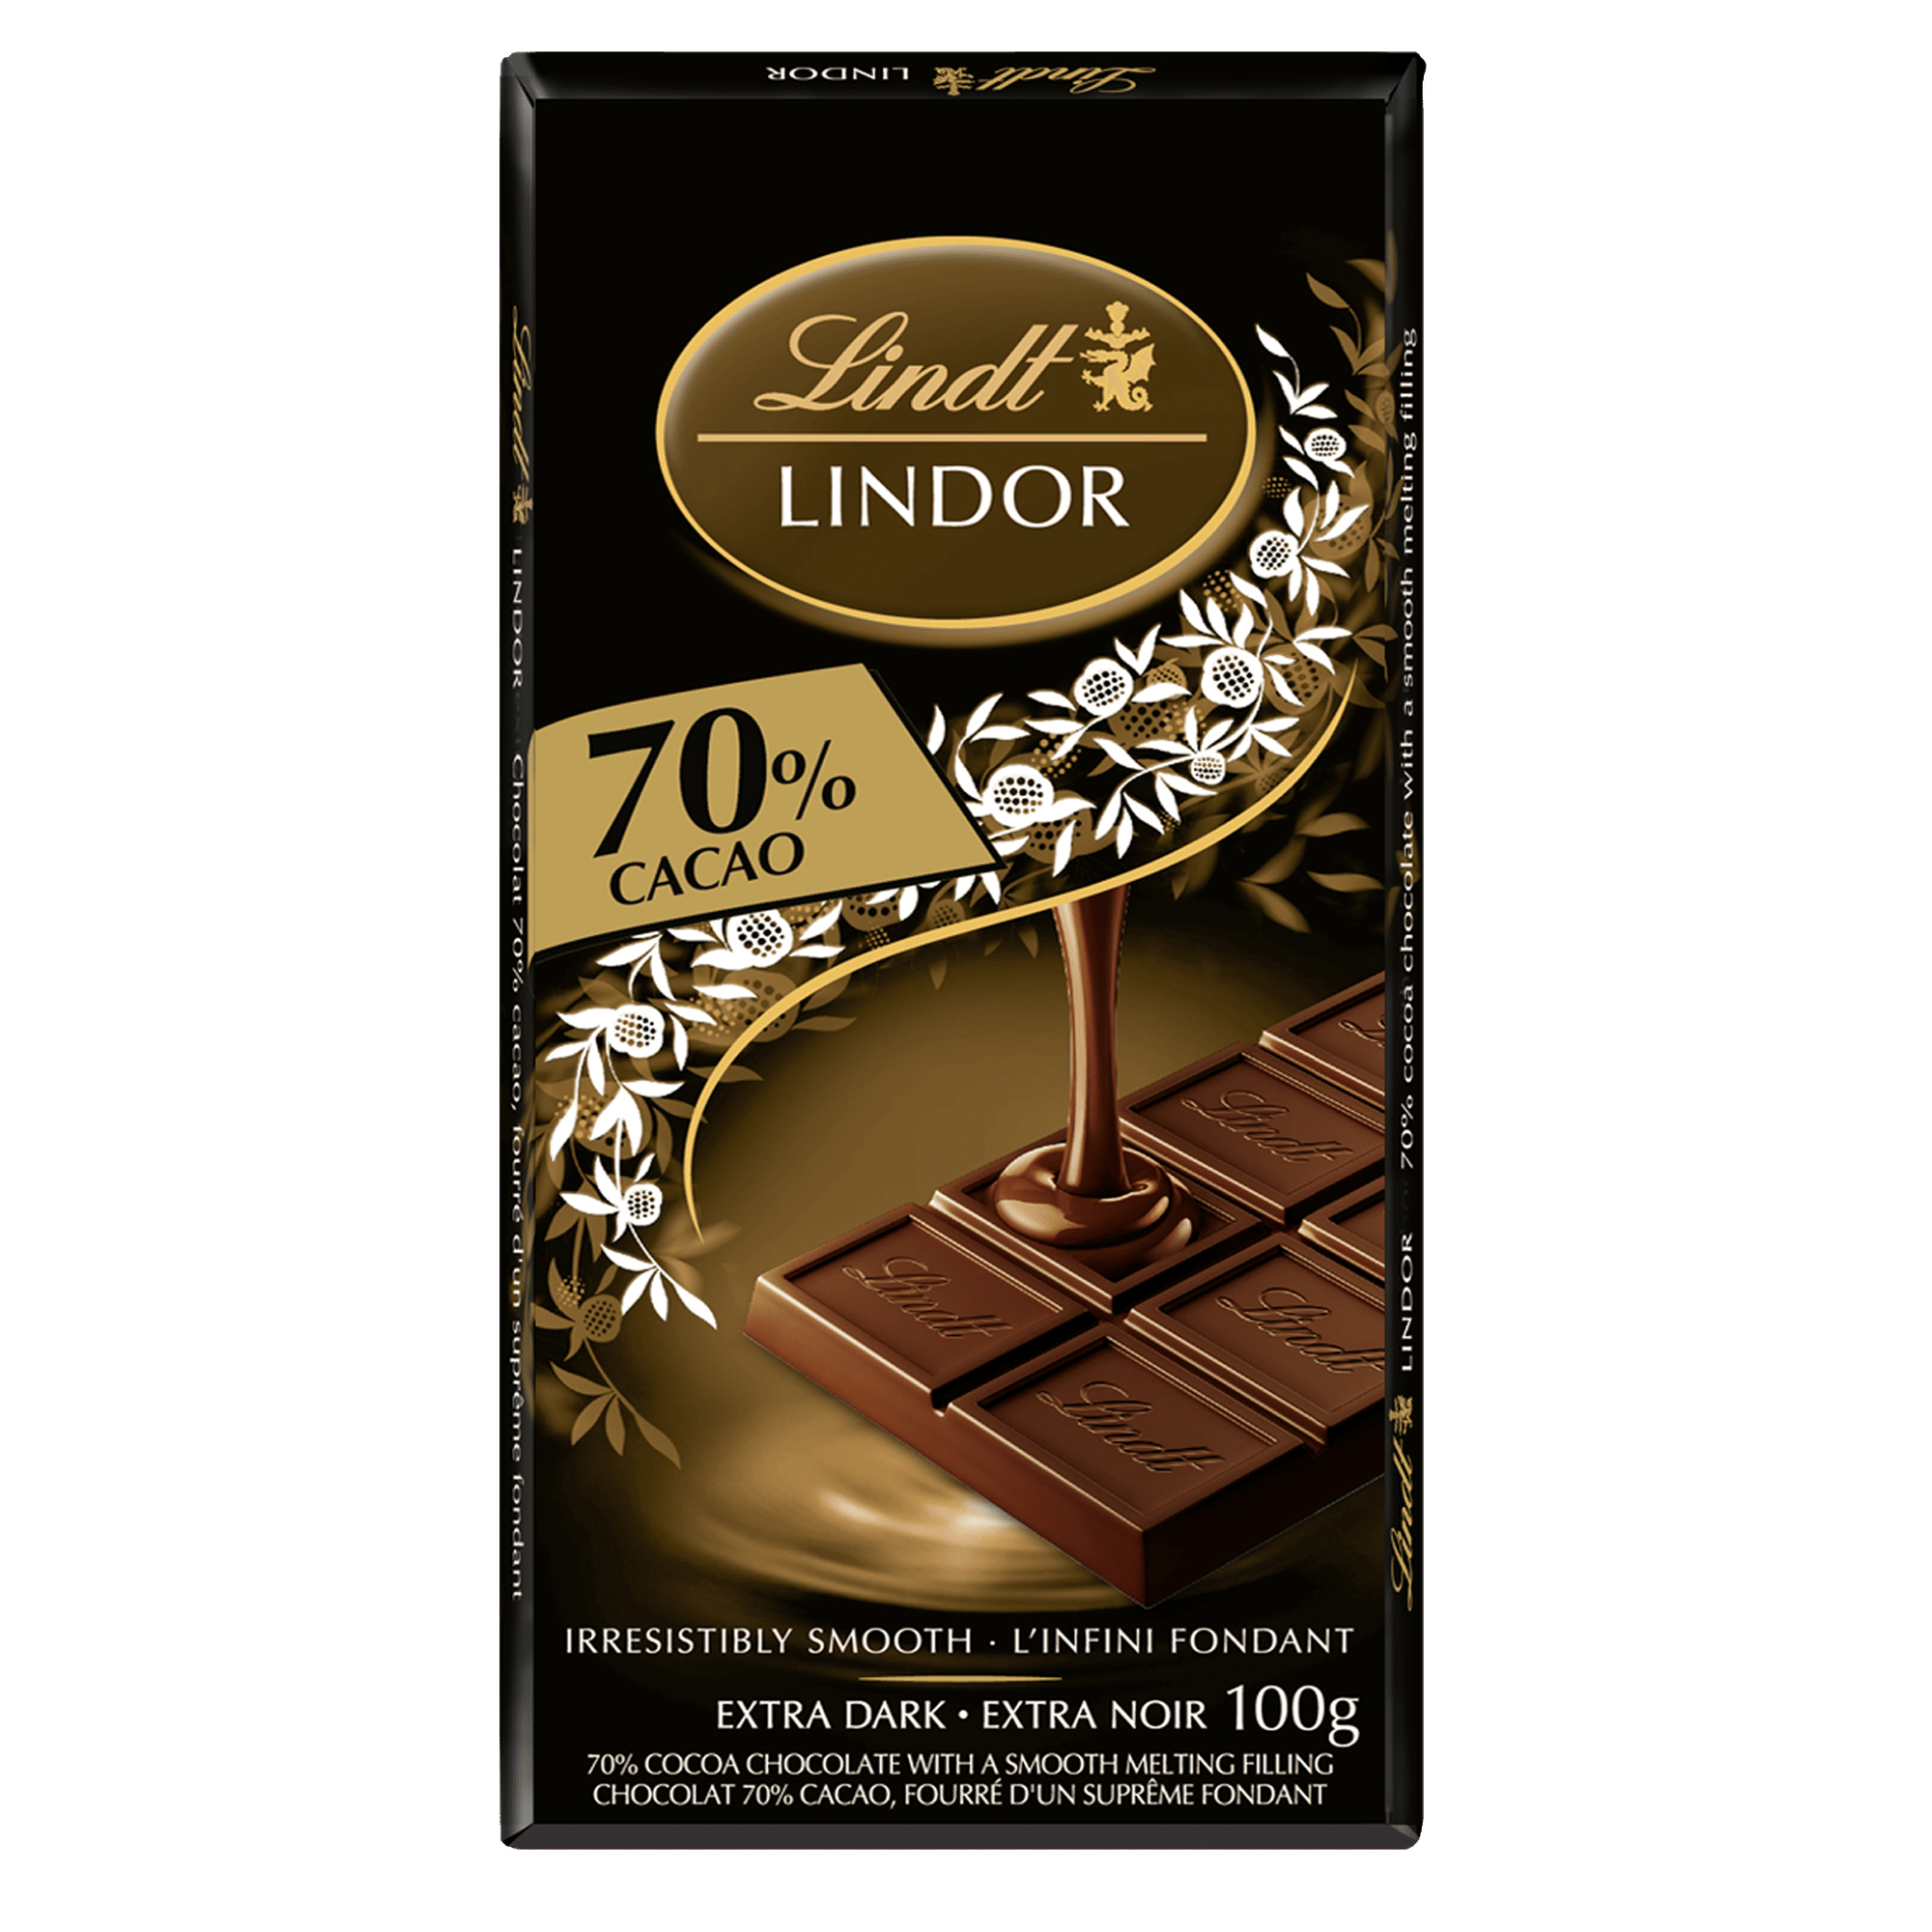 Lindt LINDOR 70% Cacoa Dark Chocolate Bar, 100 Grams